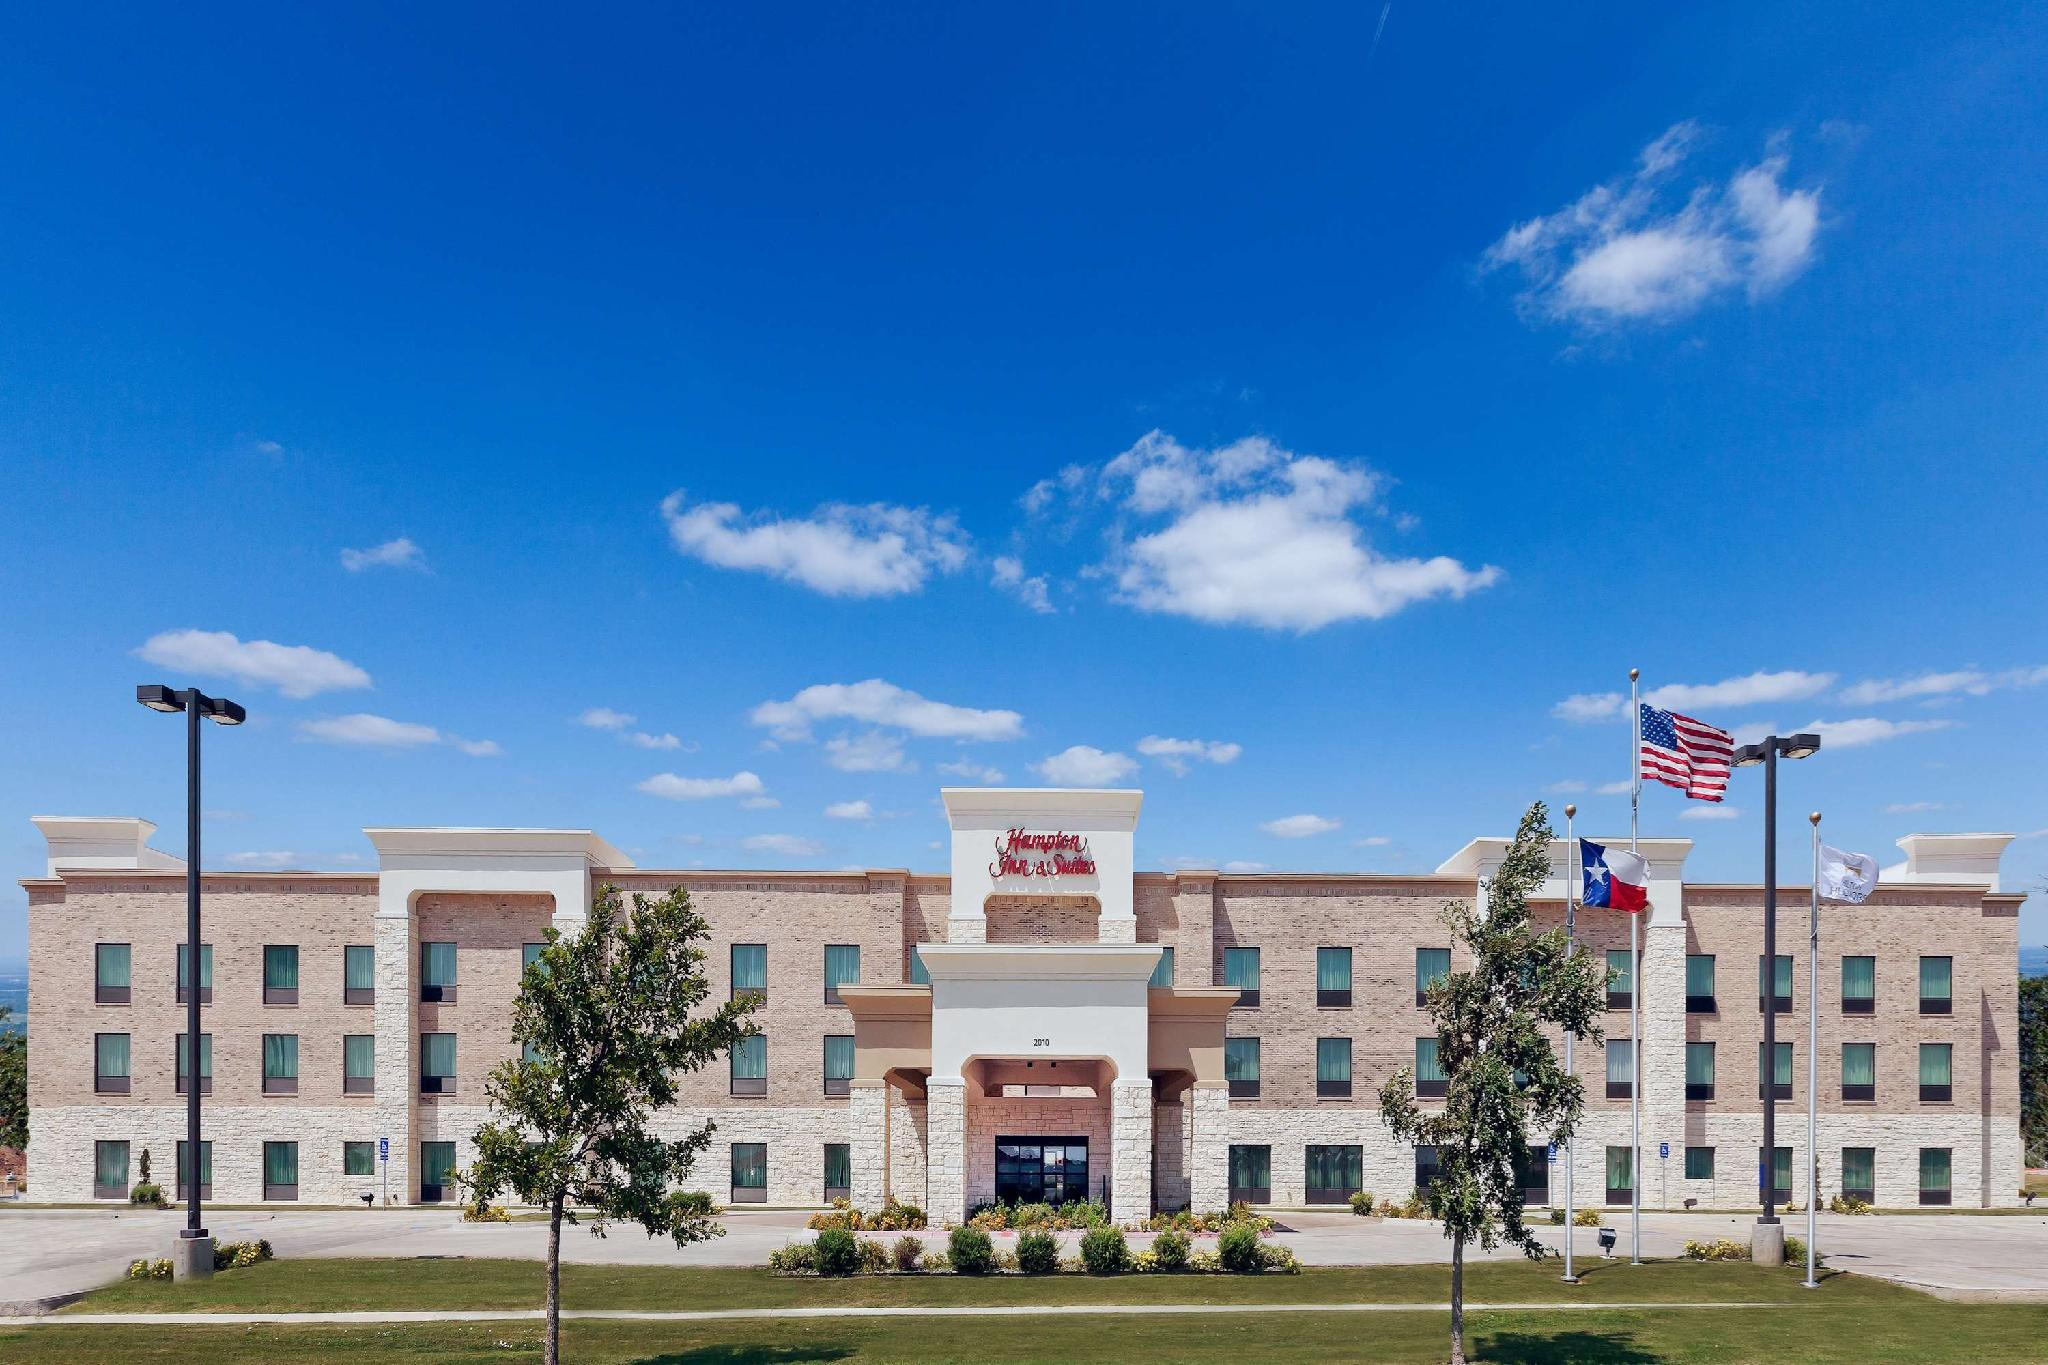 Hampton Inn And Suites Dumas